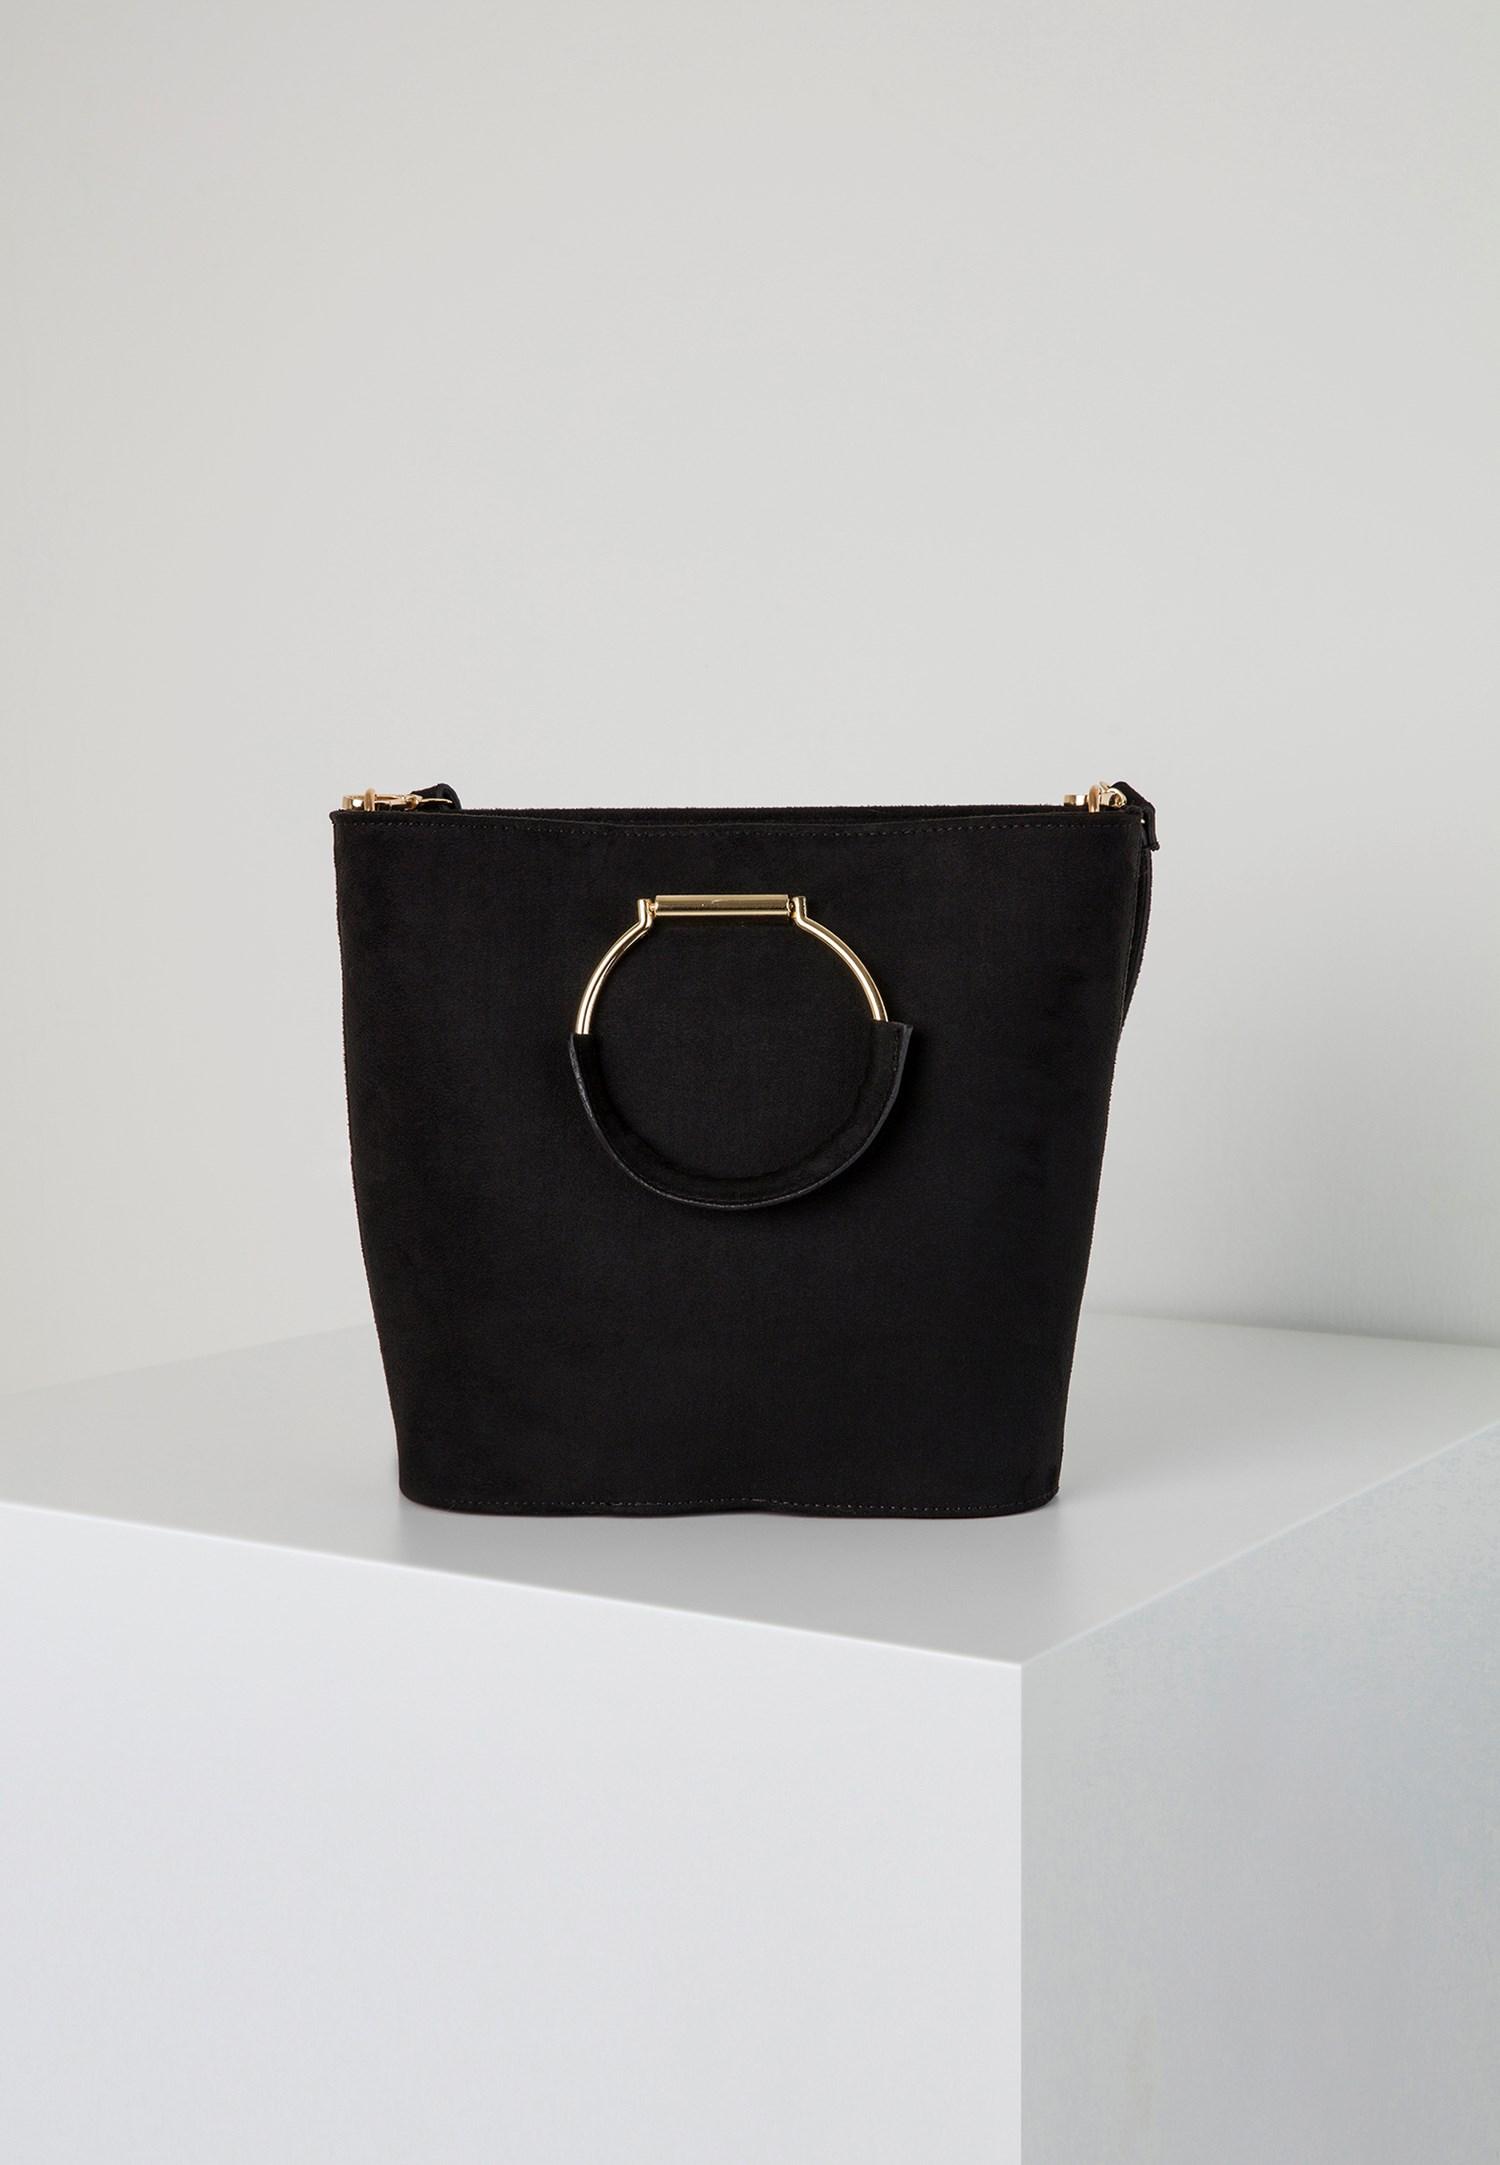 Bayan Siyah Halka Tokalı Askılı Çanta